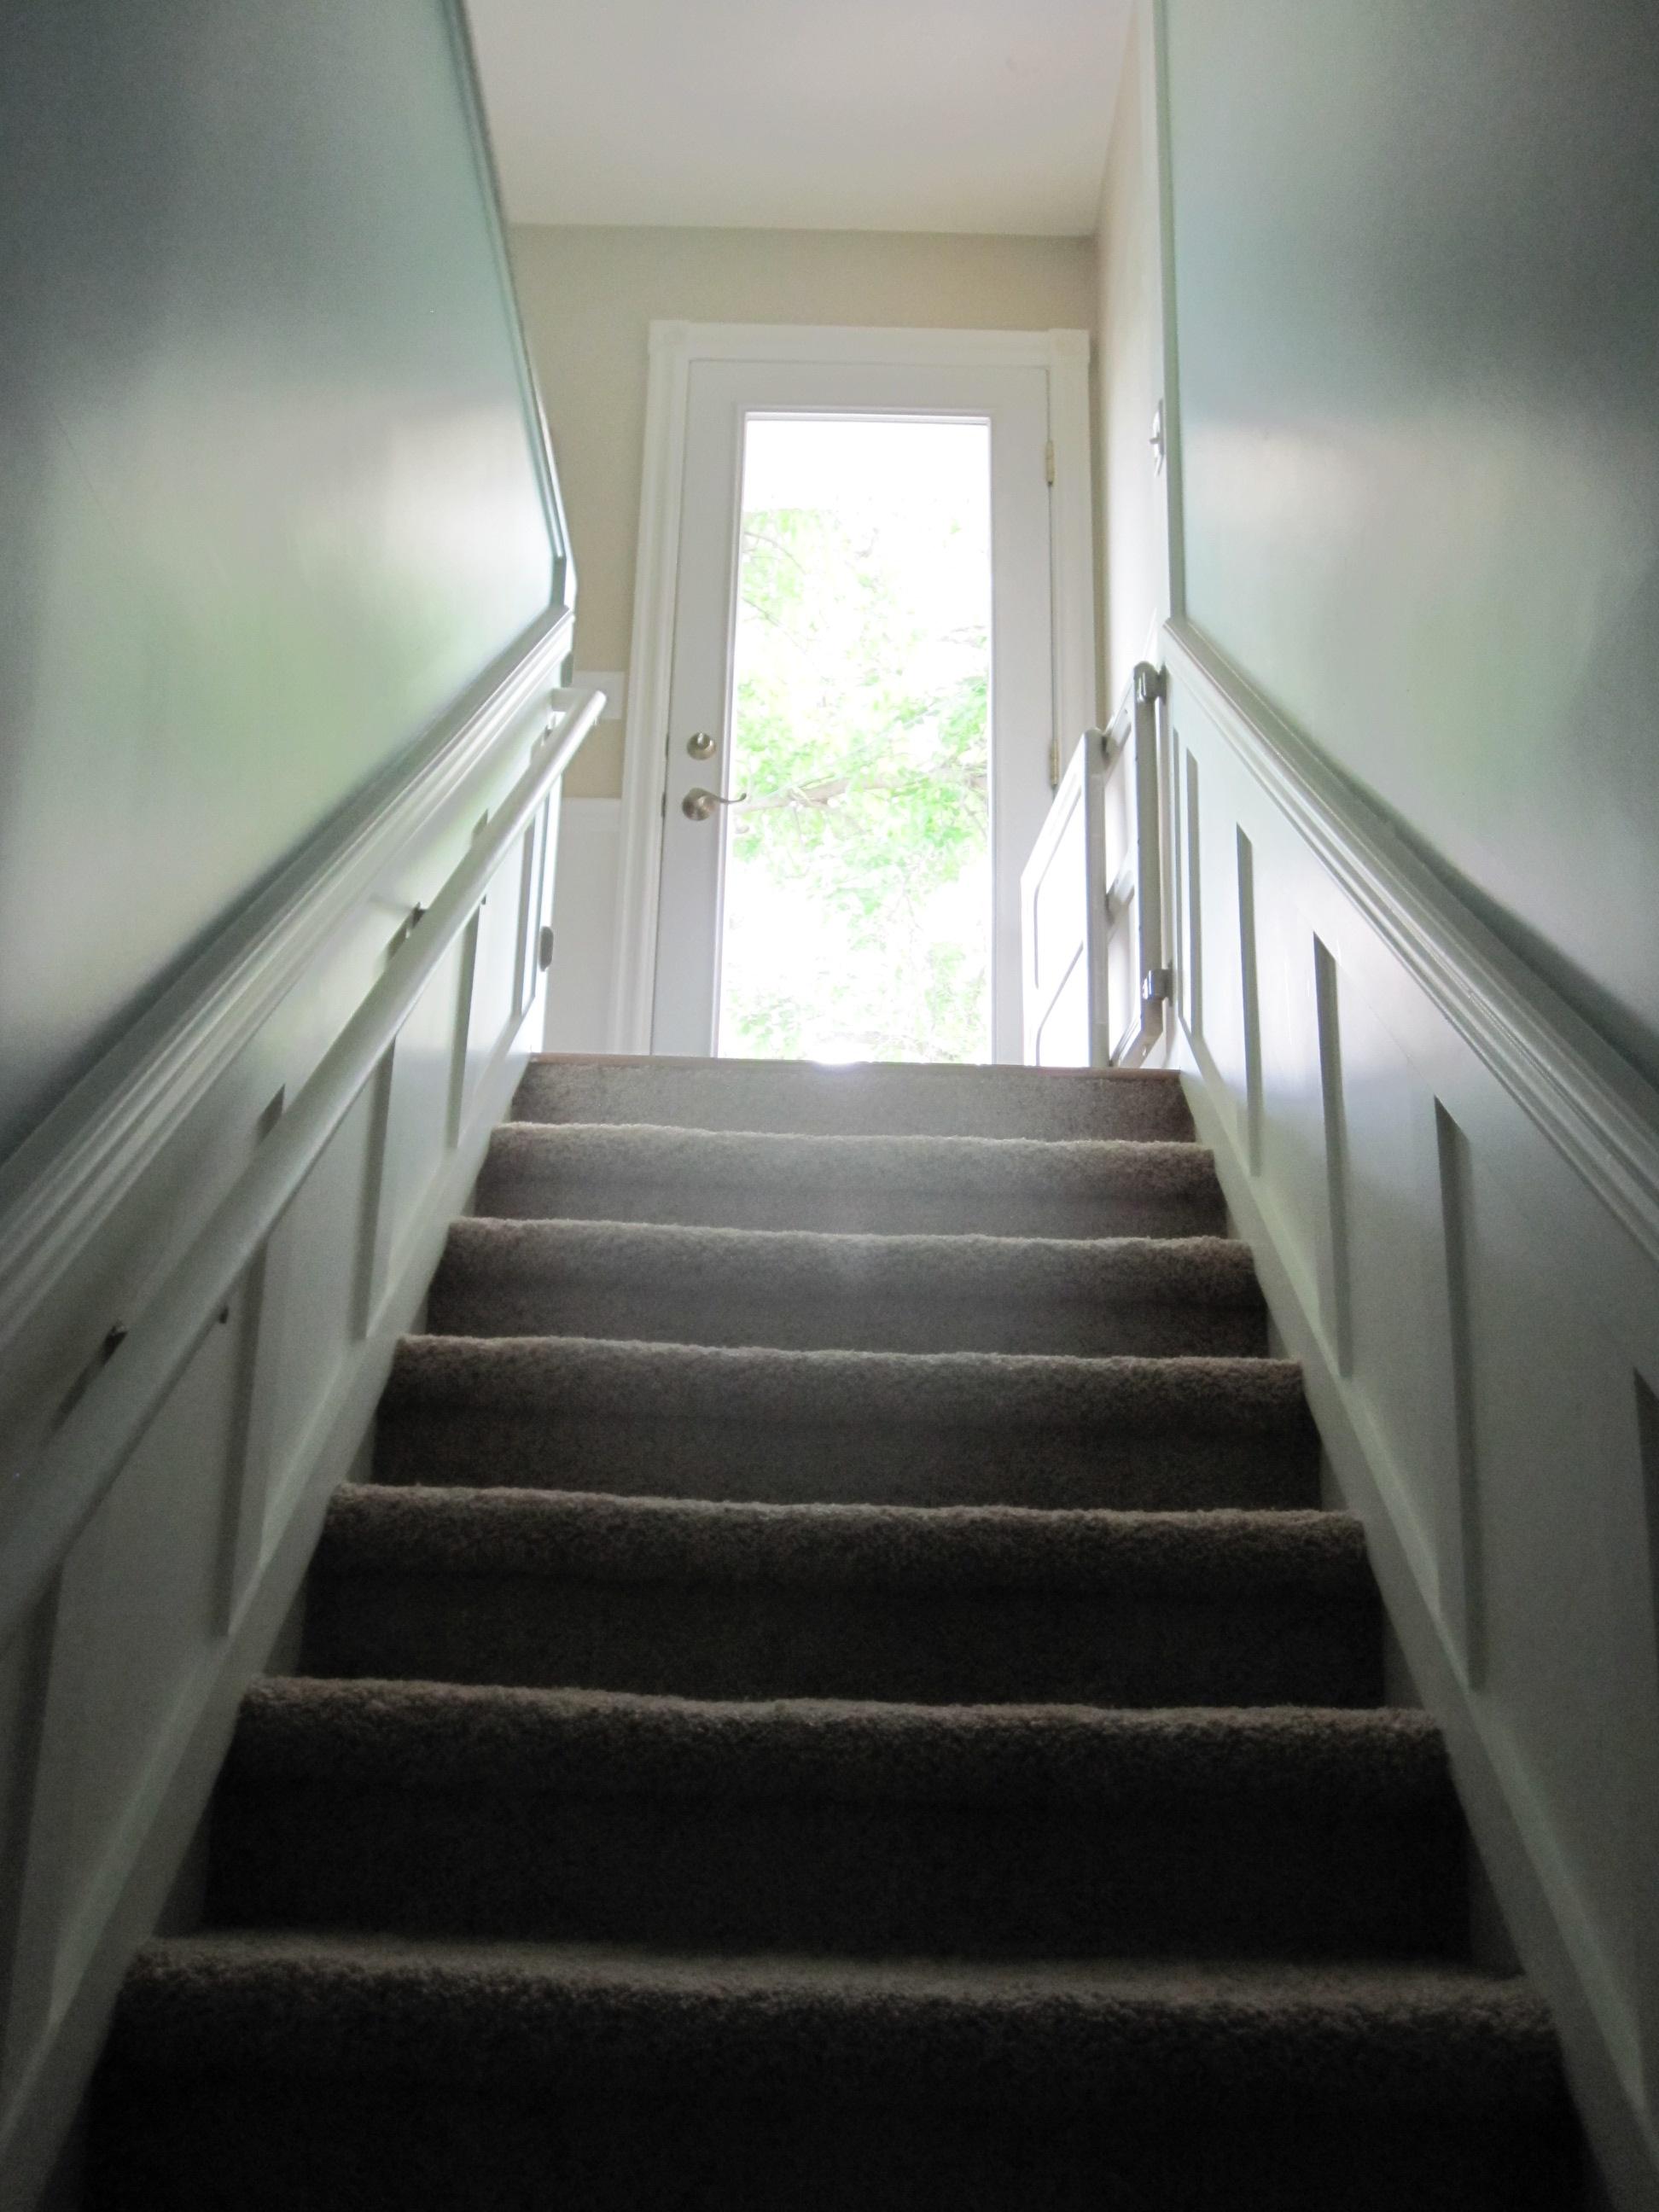 Lighting Basement Washroom Stairs: Lighten And Brighten Up